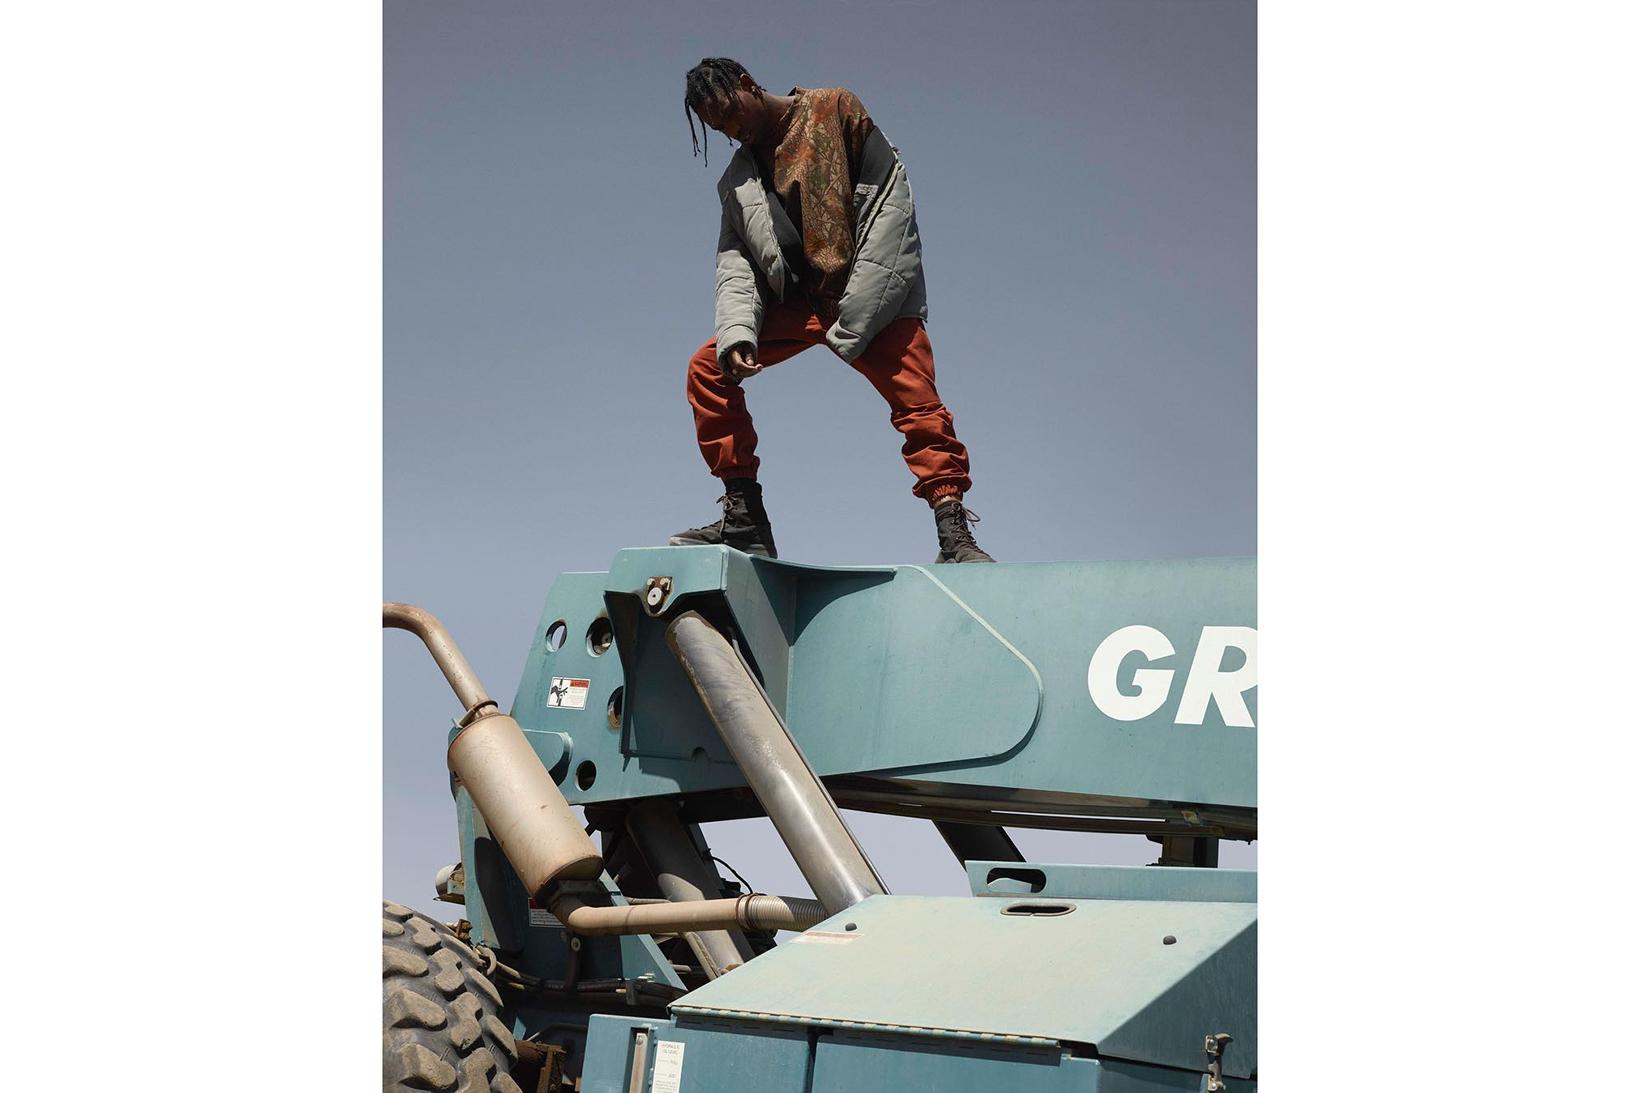 Kanye West Calabasas YEEZY 032c Kim Kardashian Khloe Travis Scott